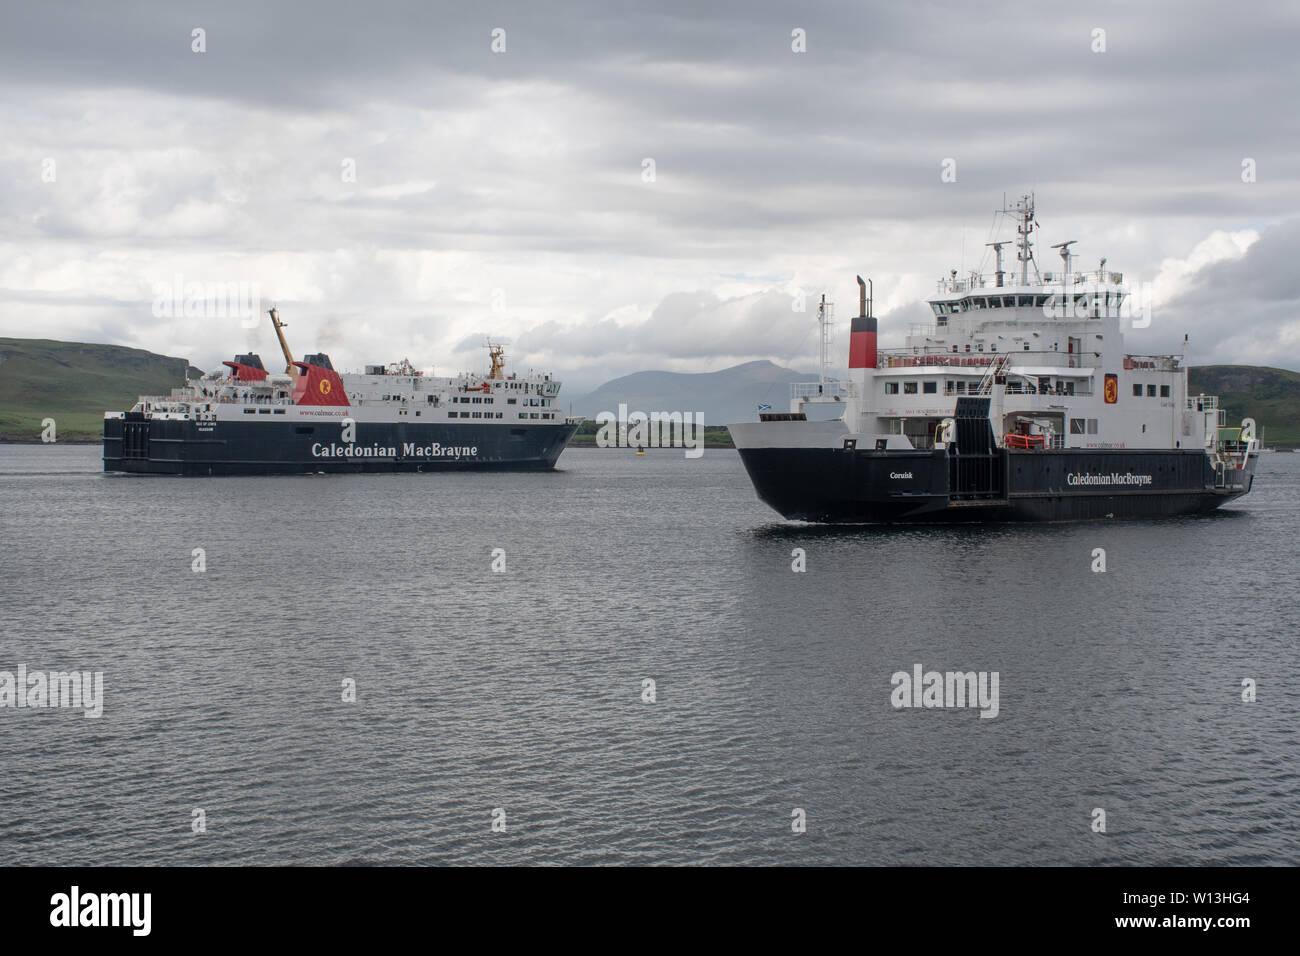 Oban  Scotland  United Kingdom  - 4 June 2019:  Two Caledonian MacBrayne Ferries Sailing From Oban Stock Photo